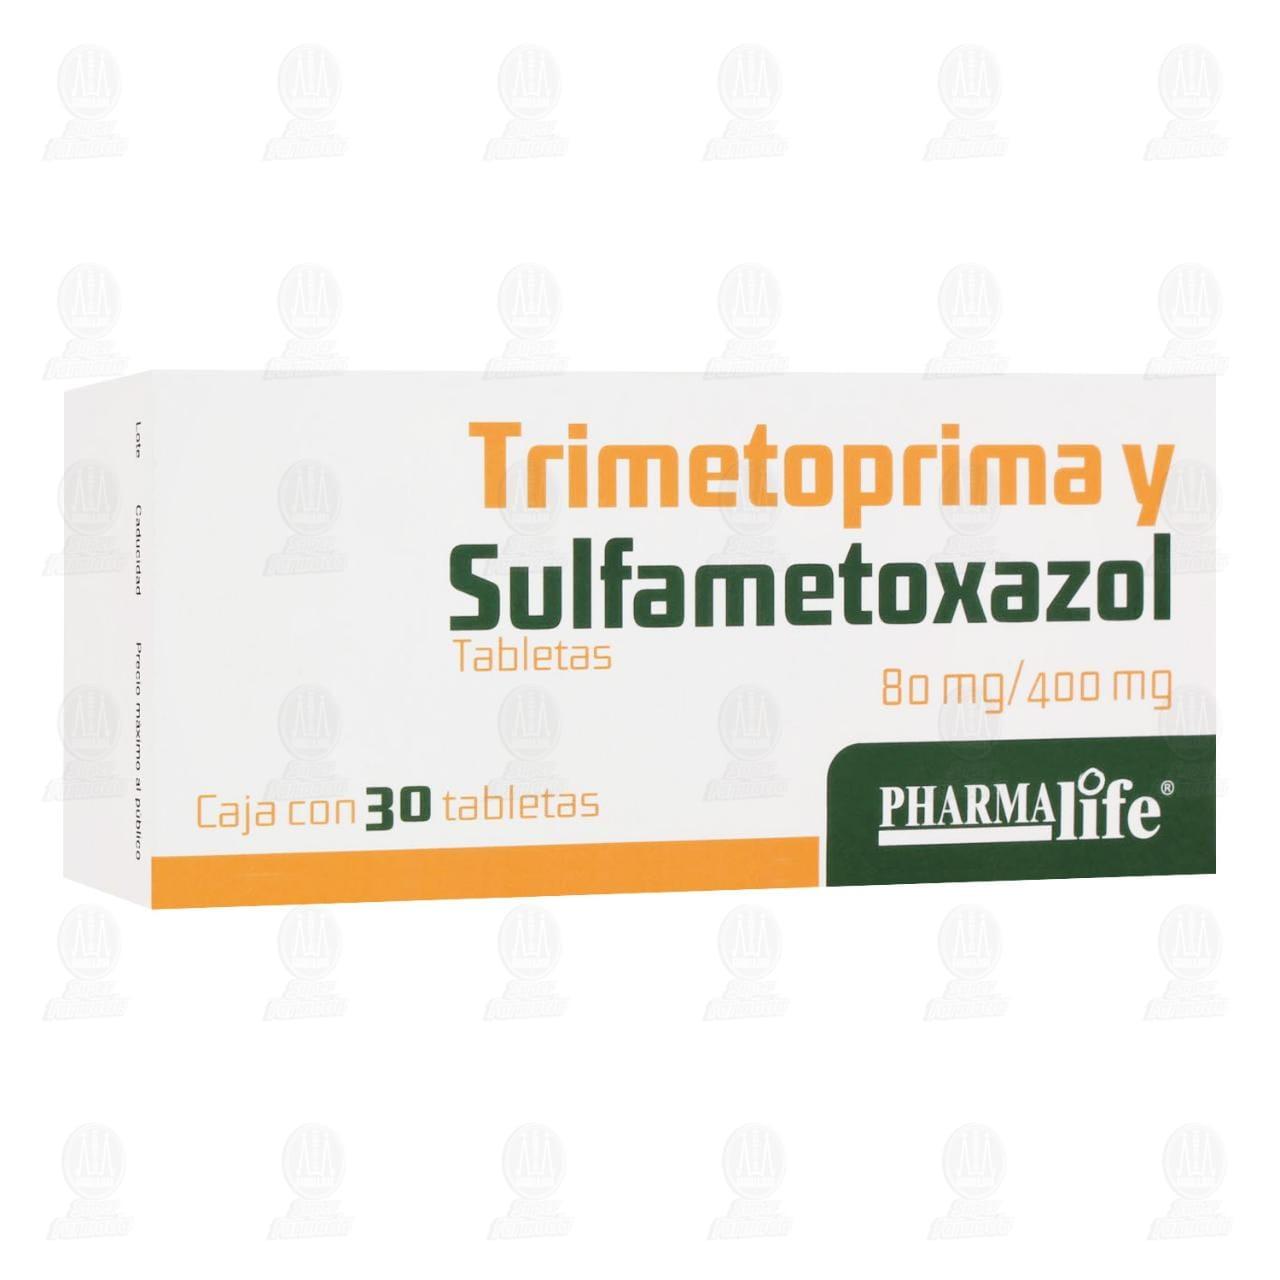 Comprar Trimetoprima y Sulfametoxazol 80mg/400mg 30 Tabletas Pharmalife en Farmacias Guadalajara